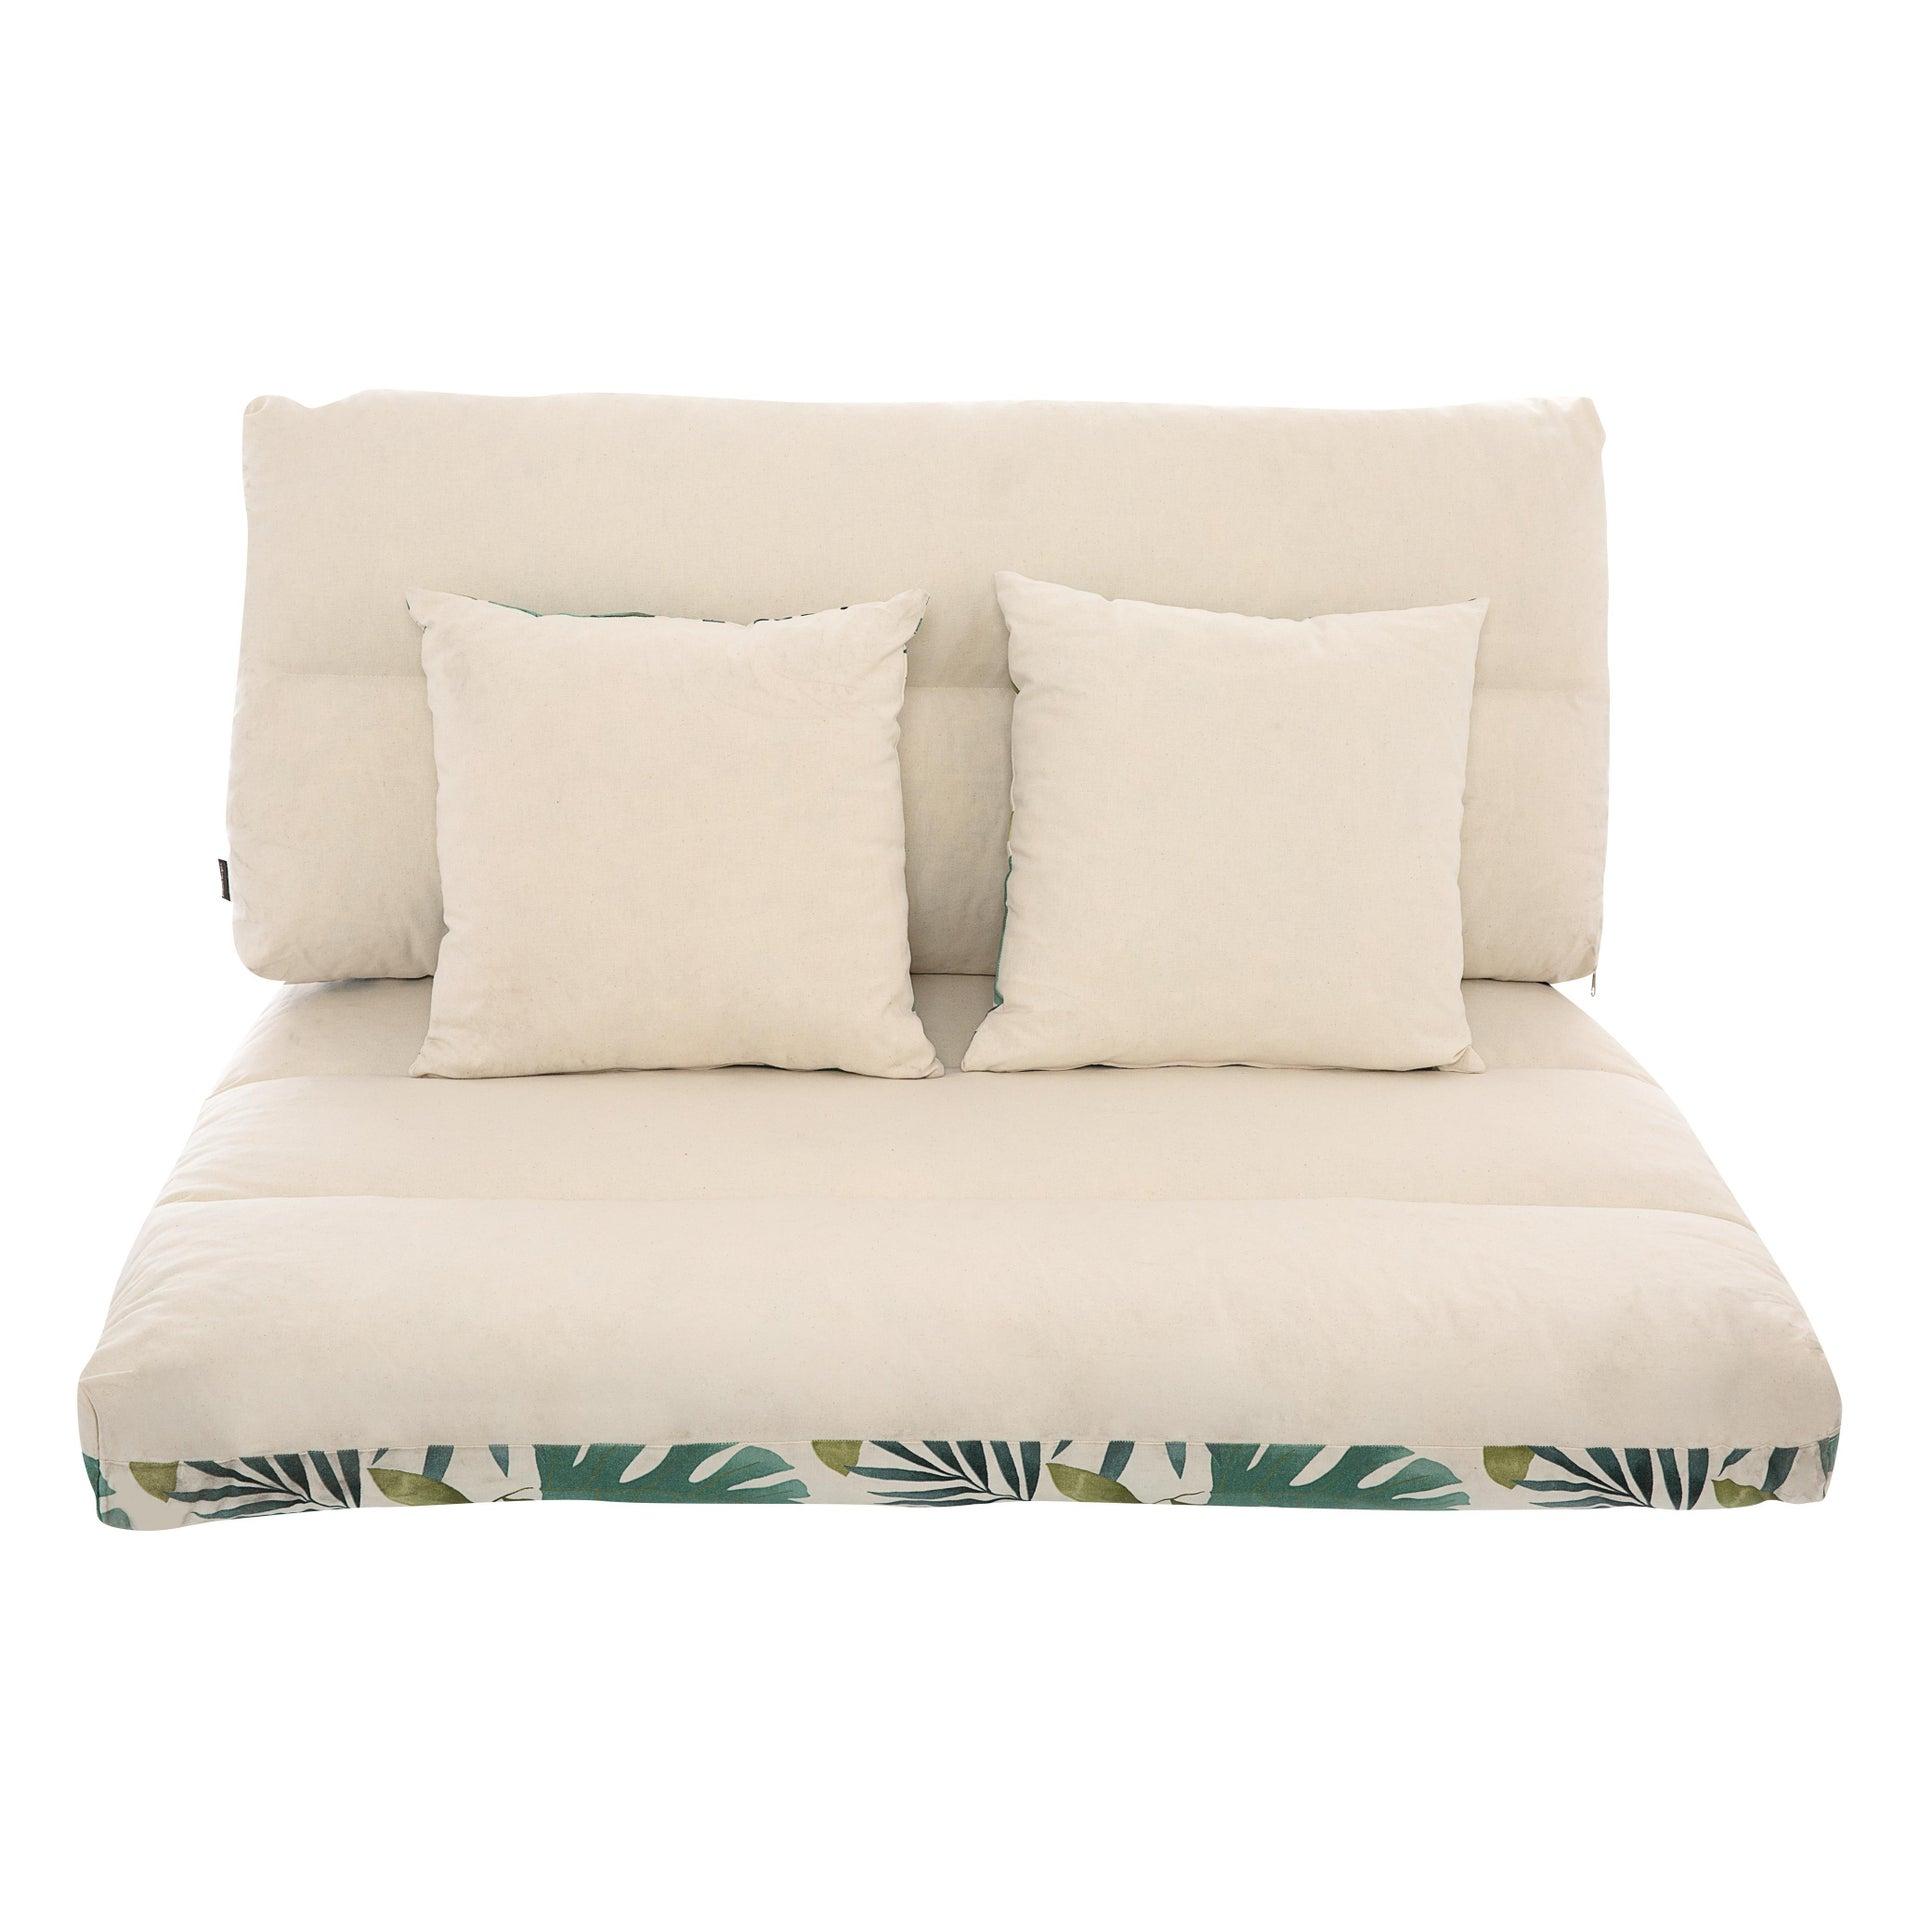 Cuscino da esterno BRASILE multicolore 120 x 80 x Sp 80 cm , 4 pezzi - 3